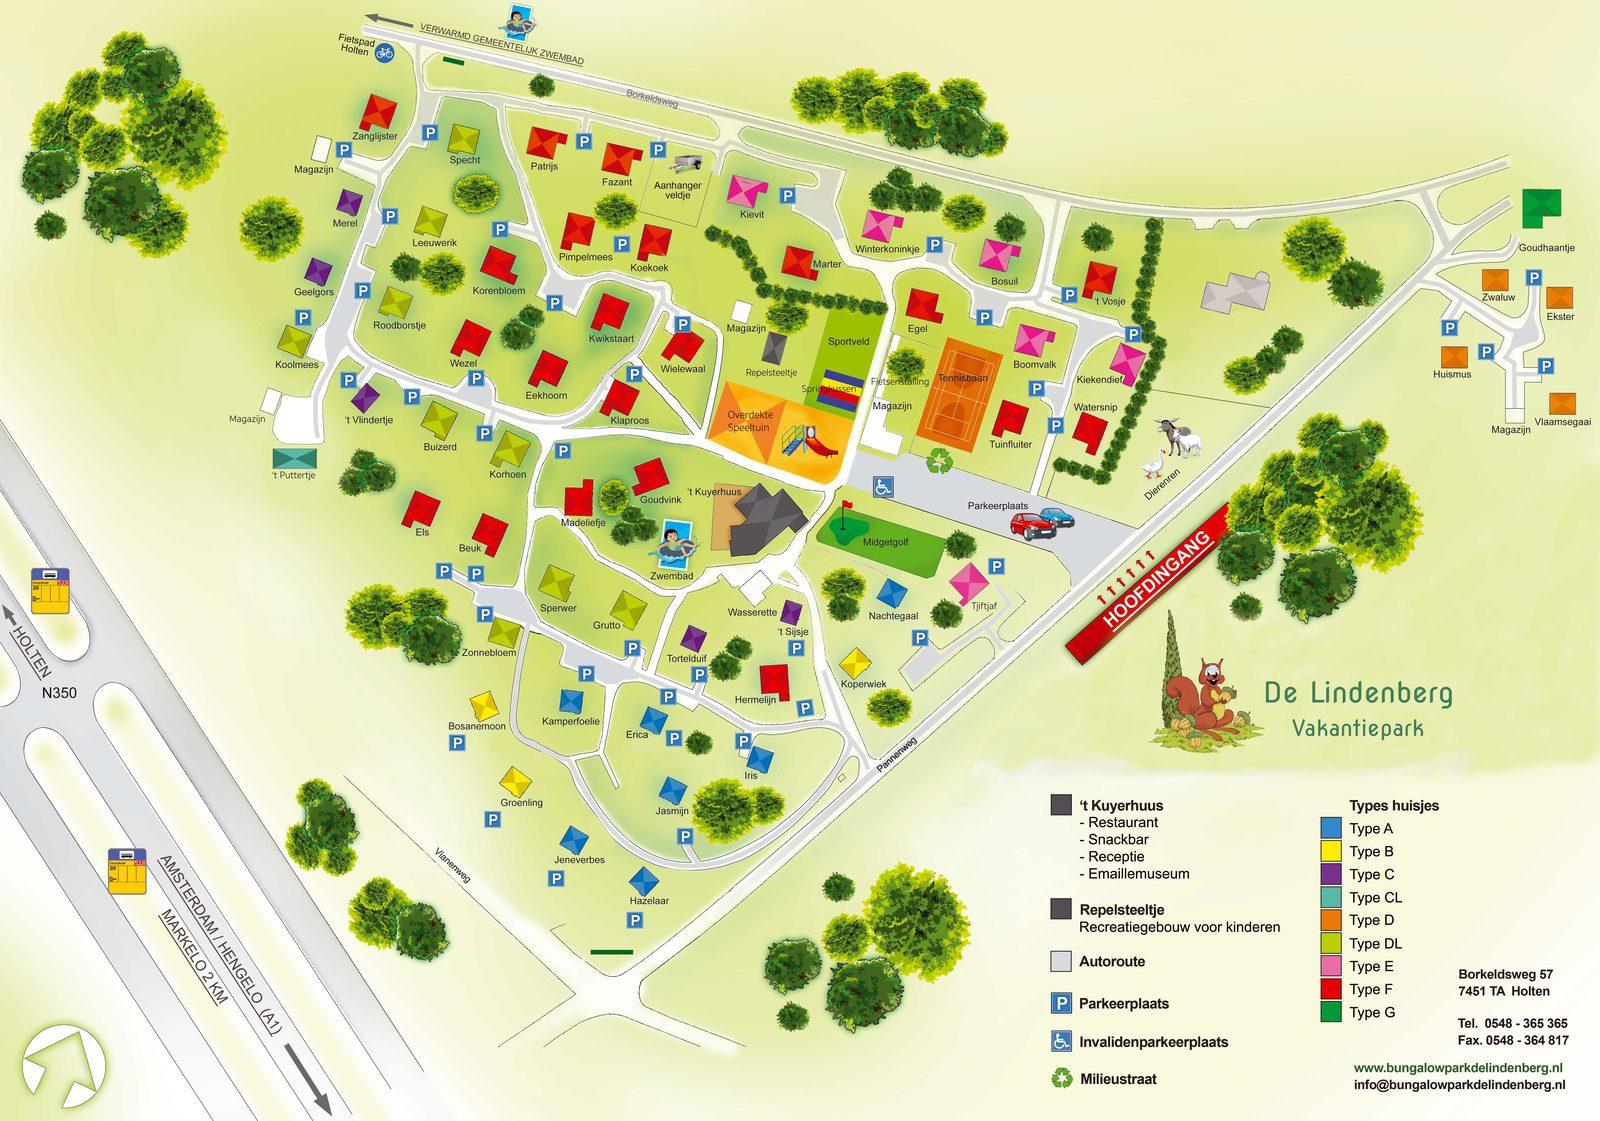 Plattegrond Vakantiepark De Lindenberg